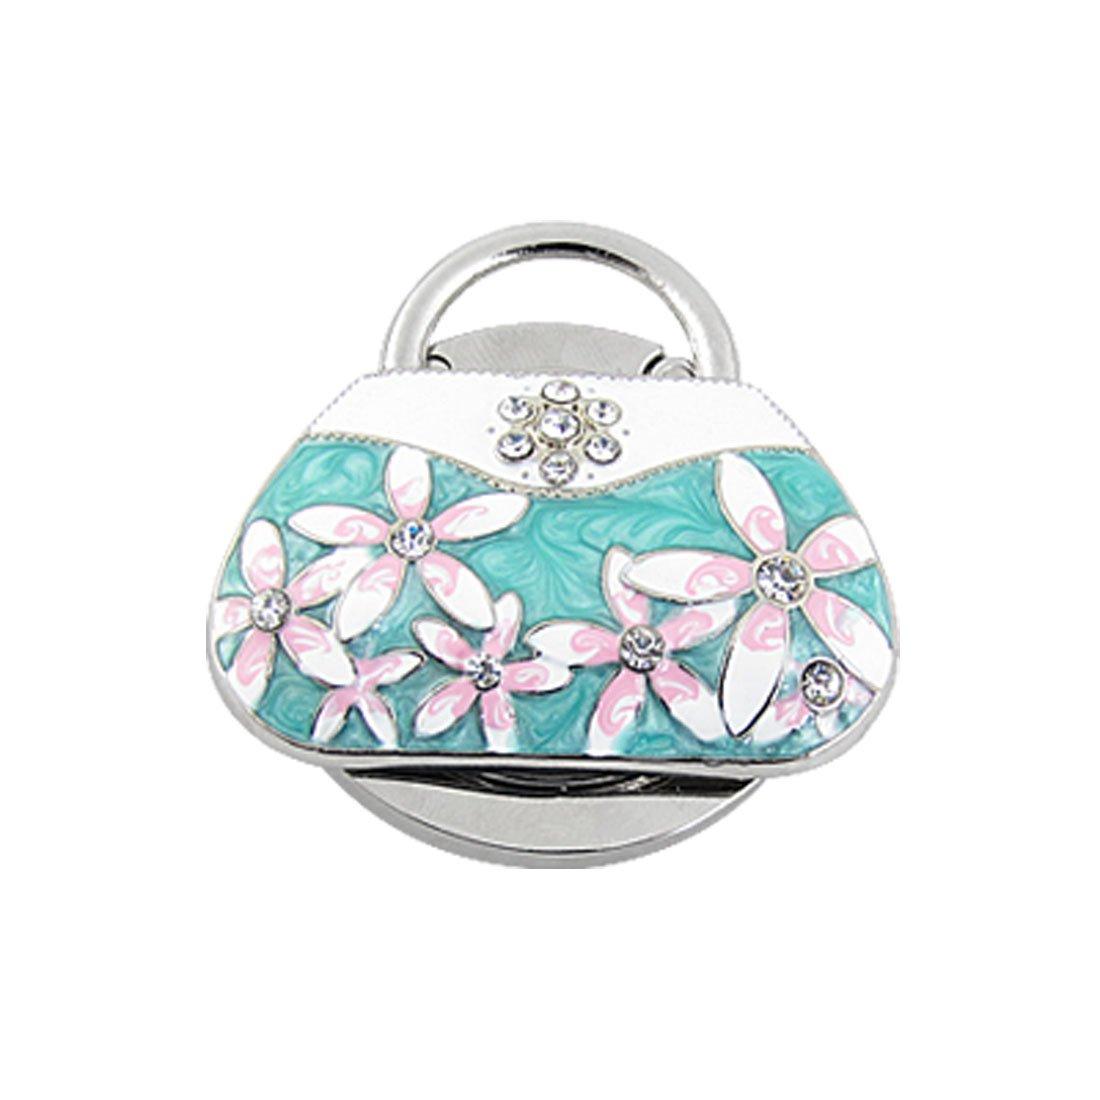 Sourcingmap Portable Handbag Hanger, Greens a11010500ux0337